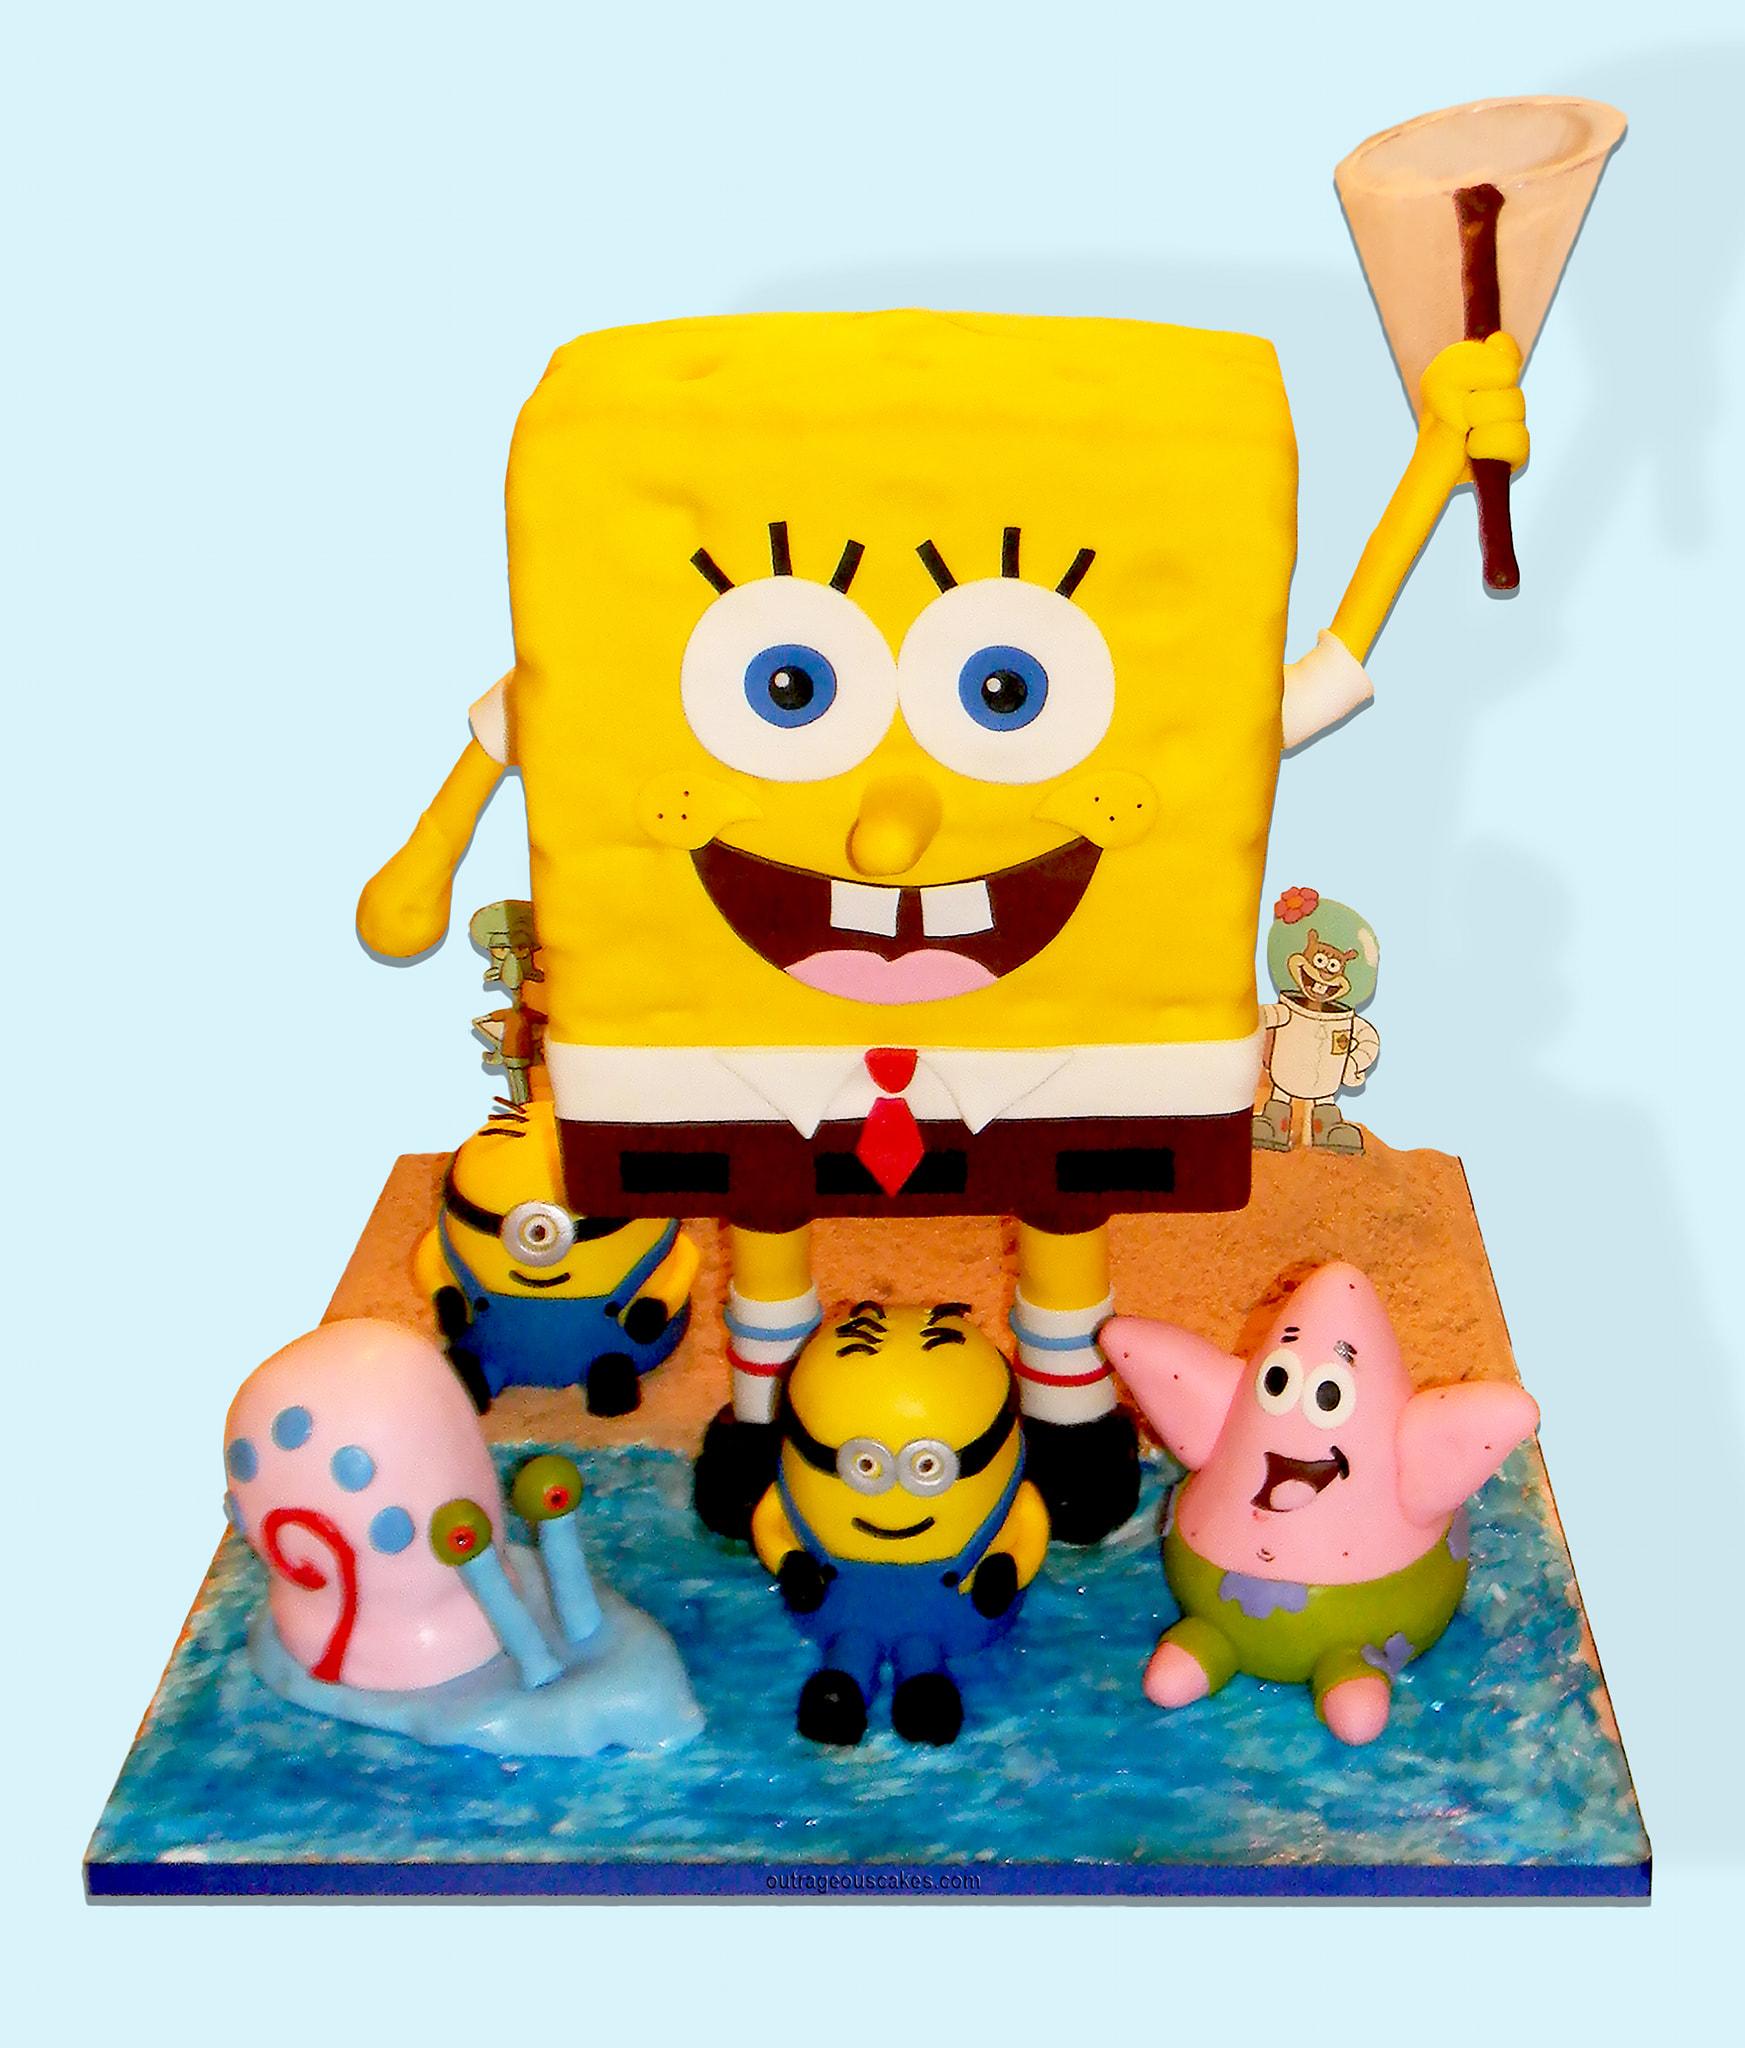 SpongeBob & Friends Cake